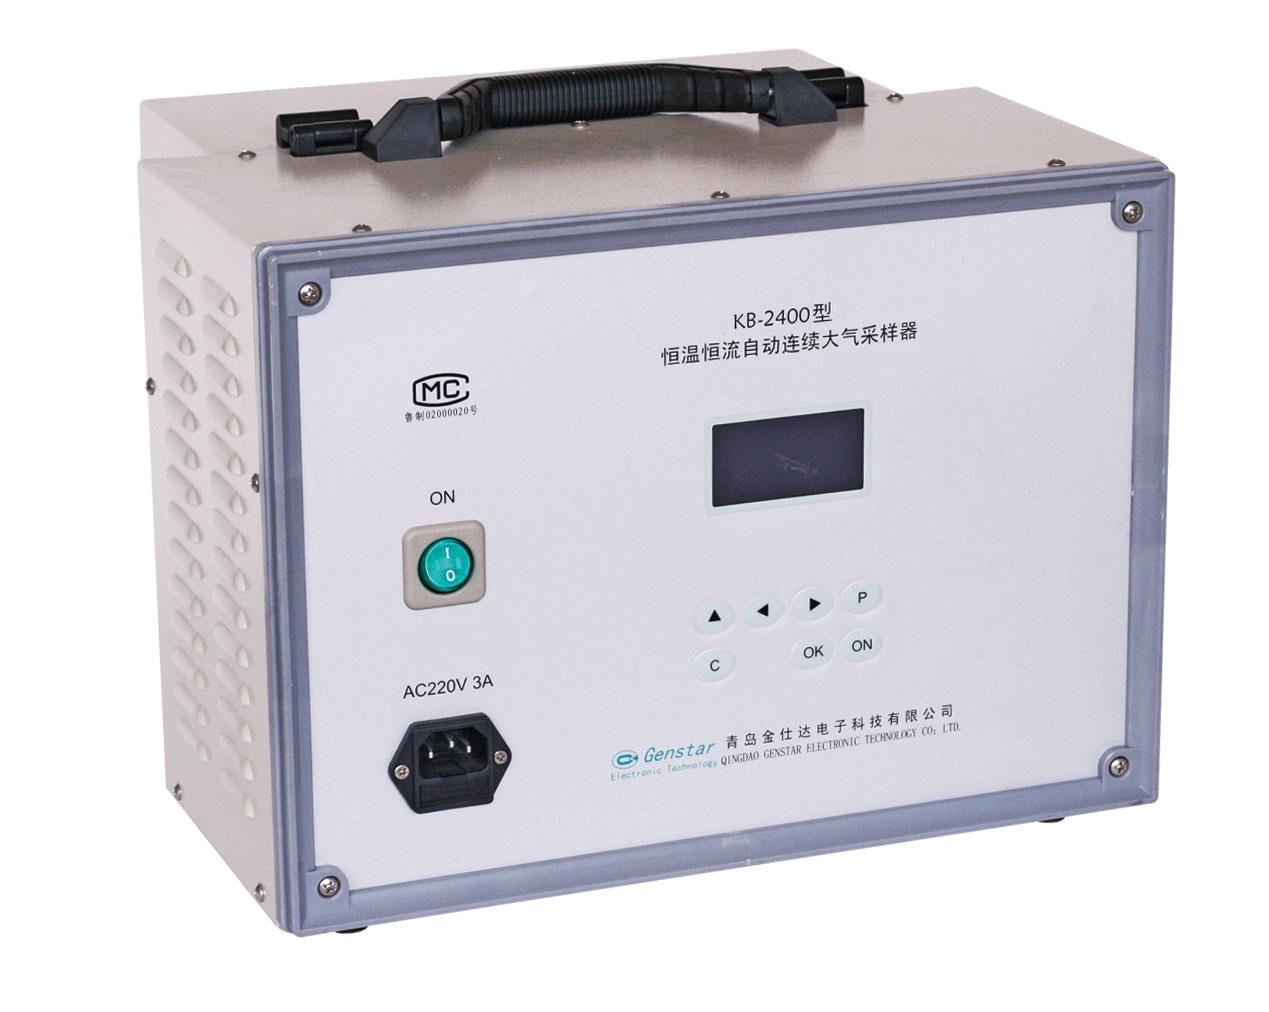 KB-2400型(A) 恒温恒流连续自动大气采样器